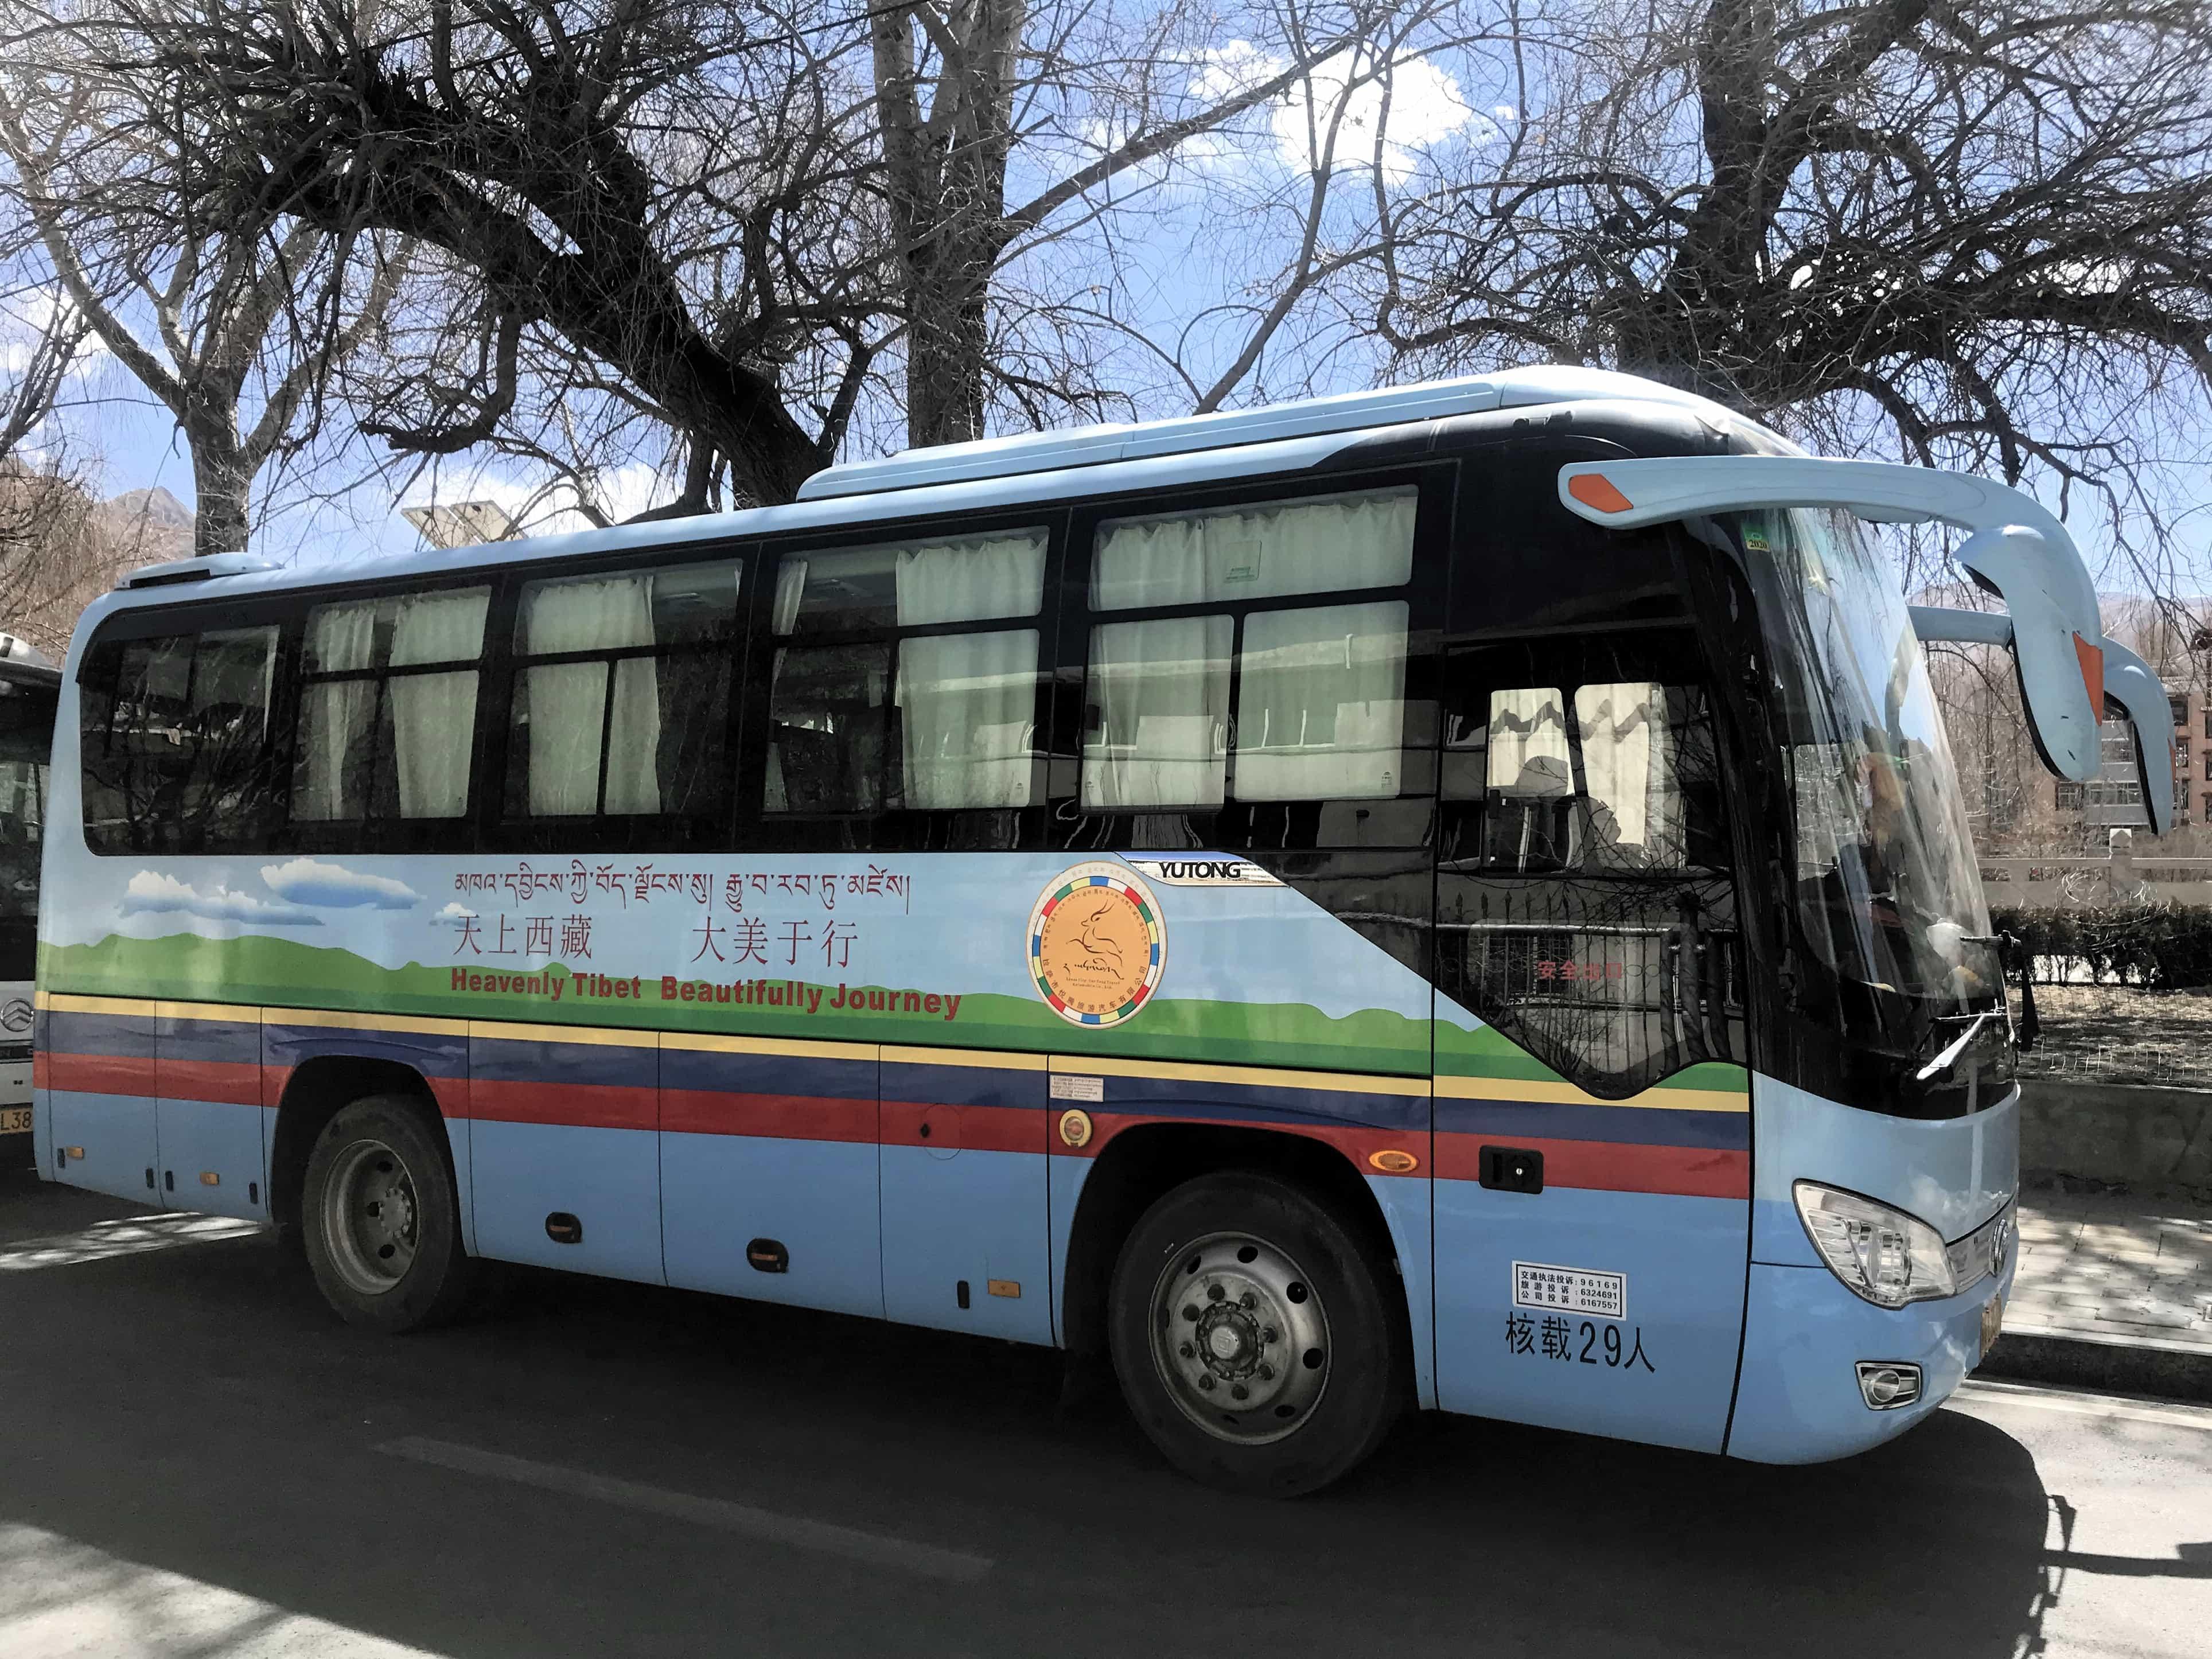 Tourist bus in Tibet